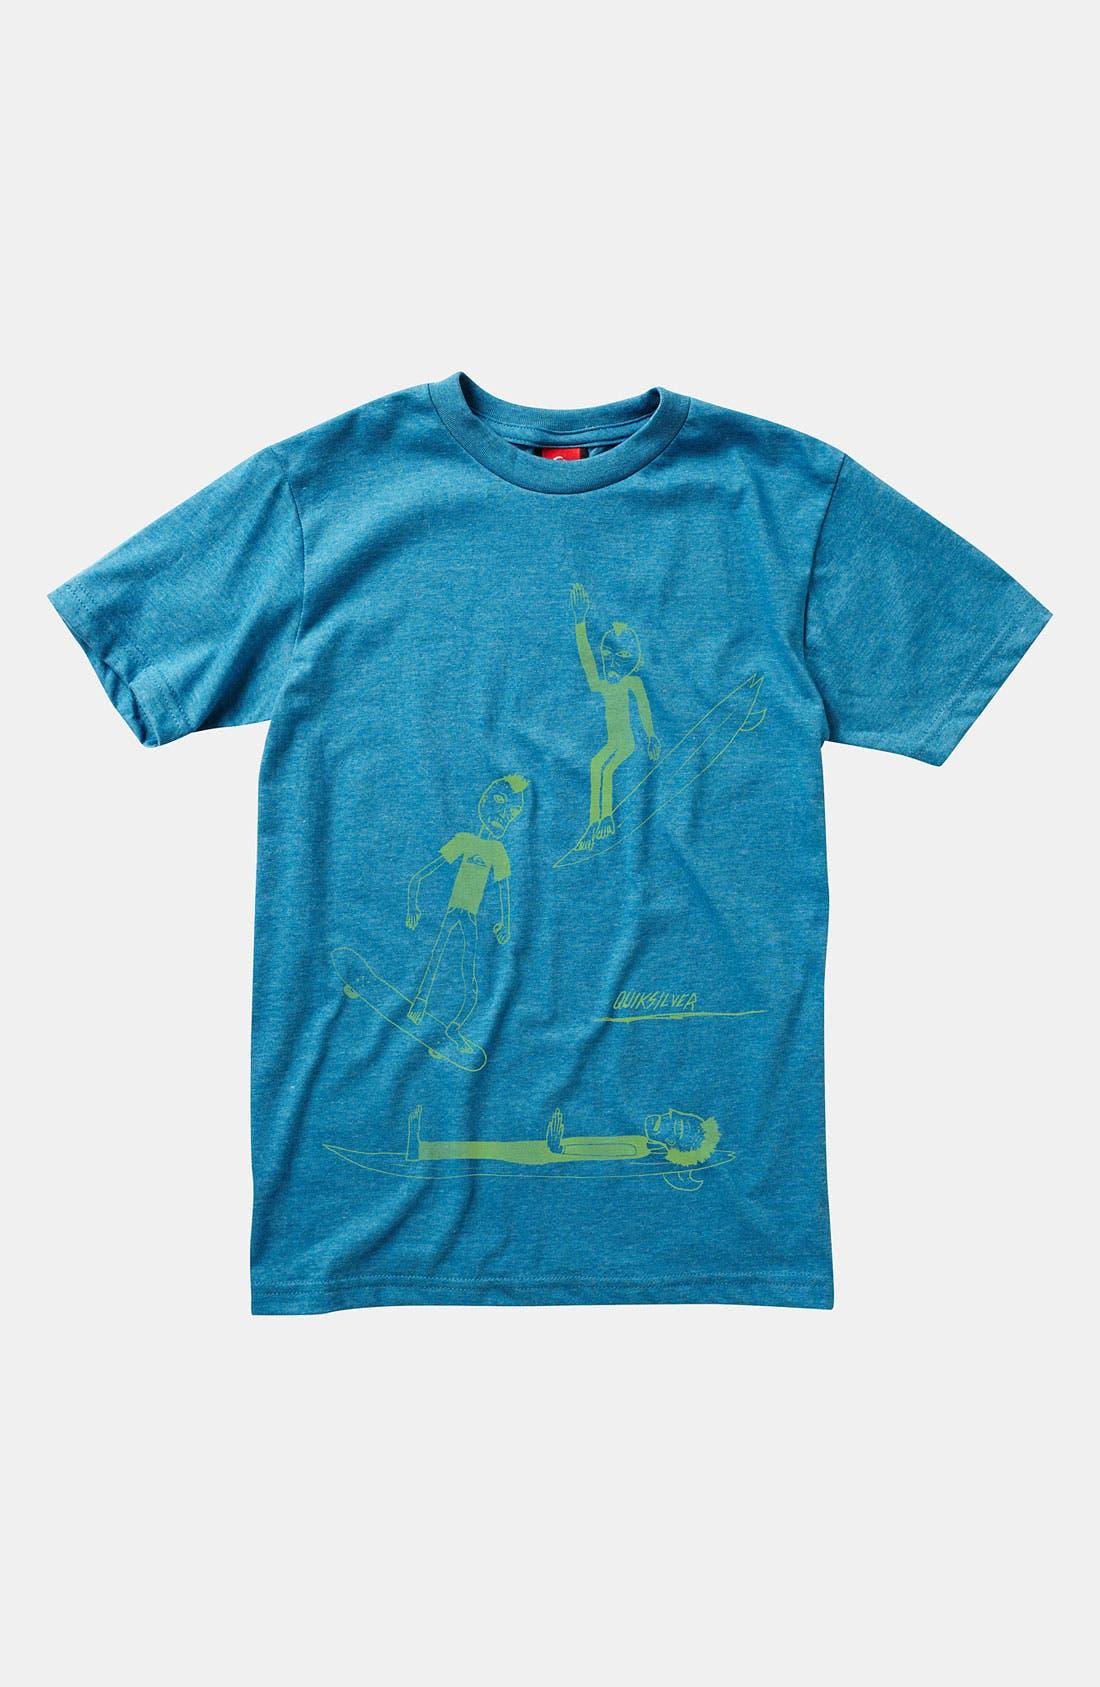 Alternate Image 1 Selected - Quiksilver 'Get Up' T-Shirt (Big Boys)